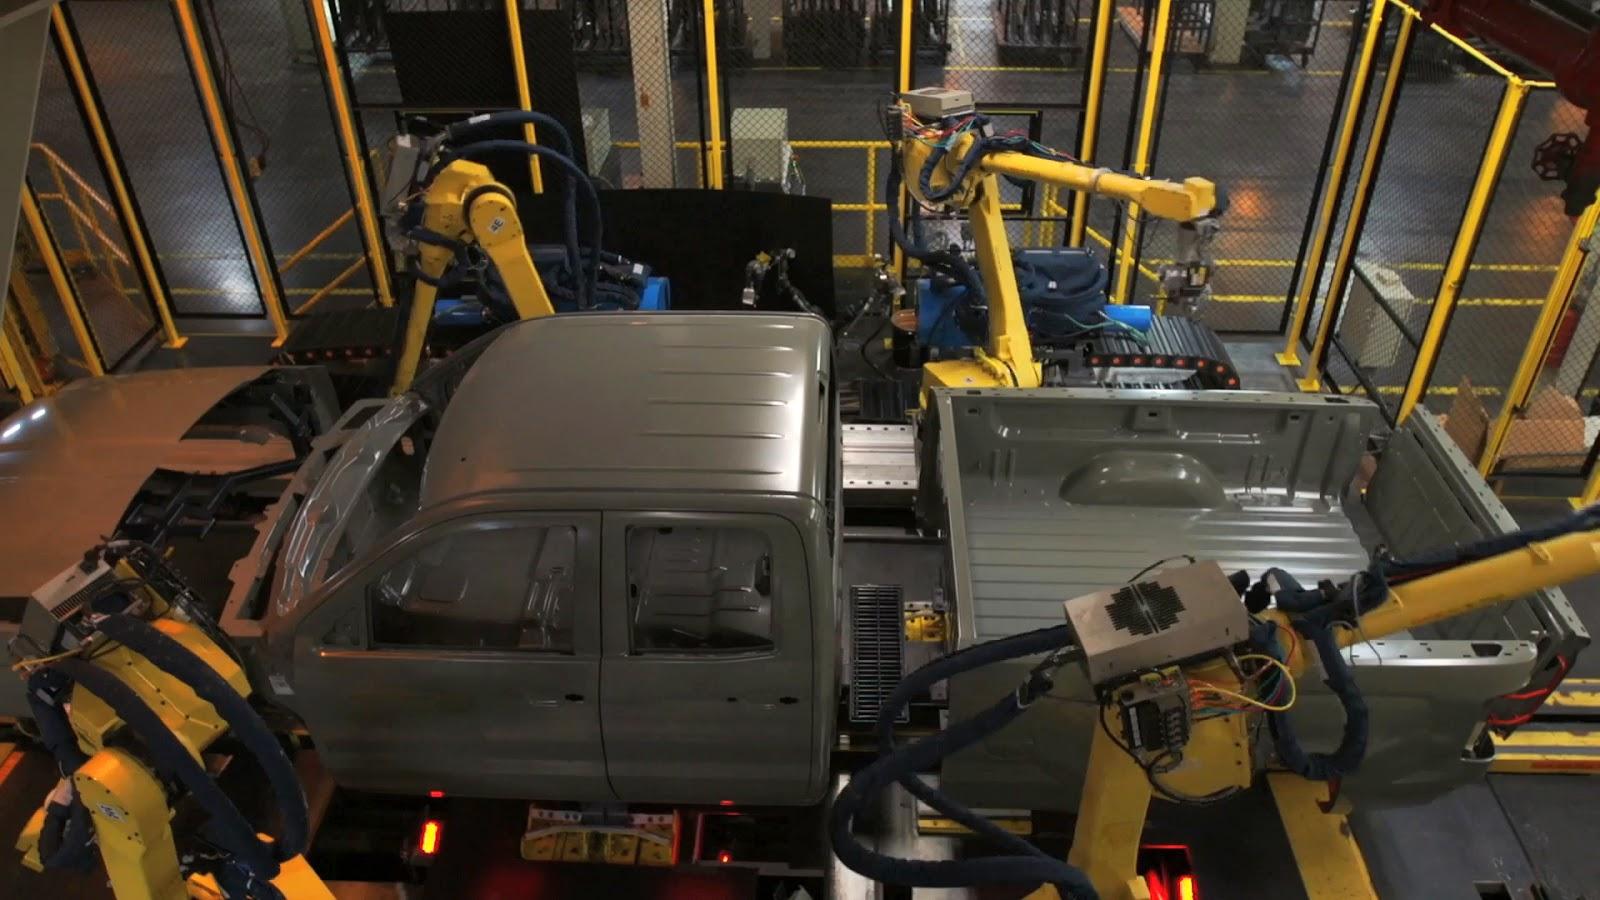 Perry Auto Group 2014 Silverado Is Most Corrosion